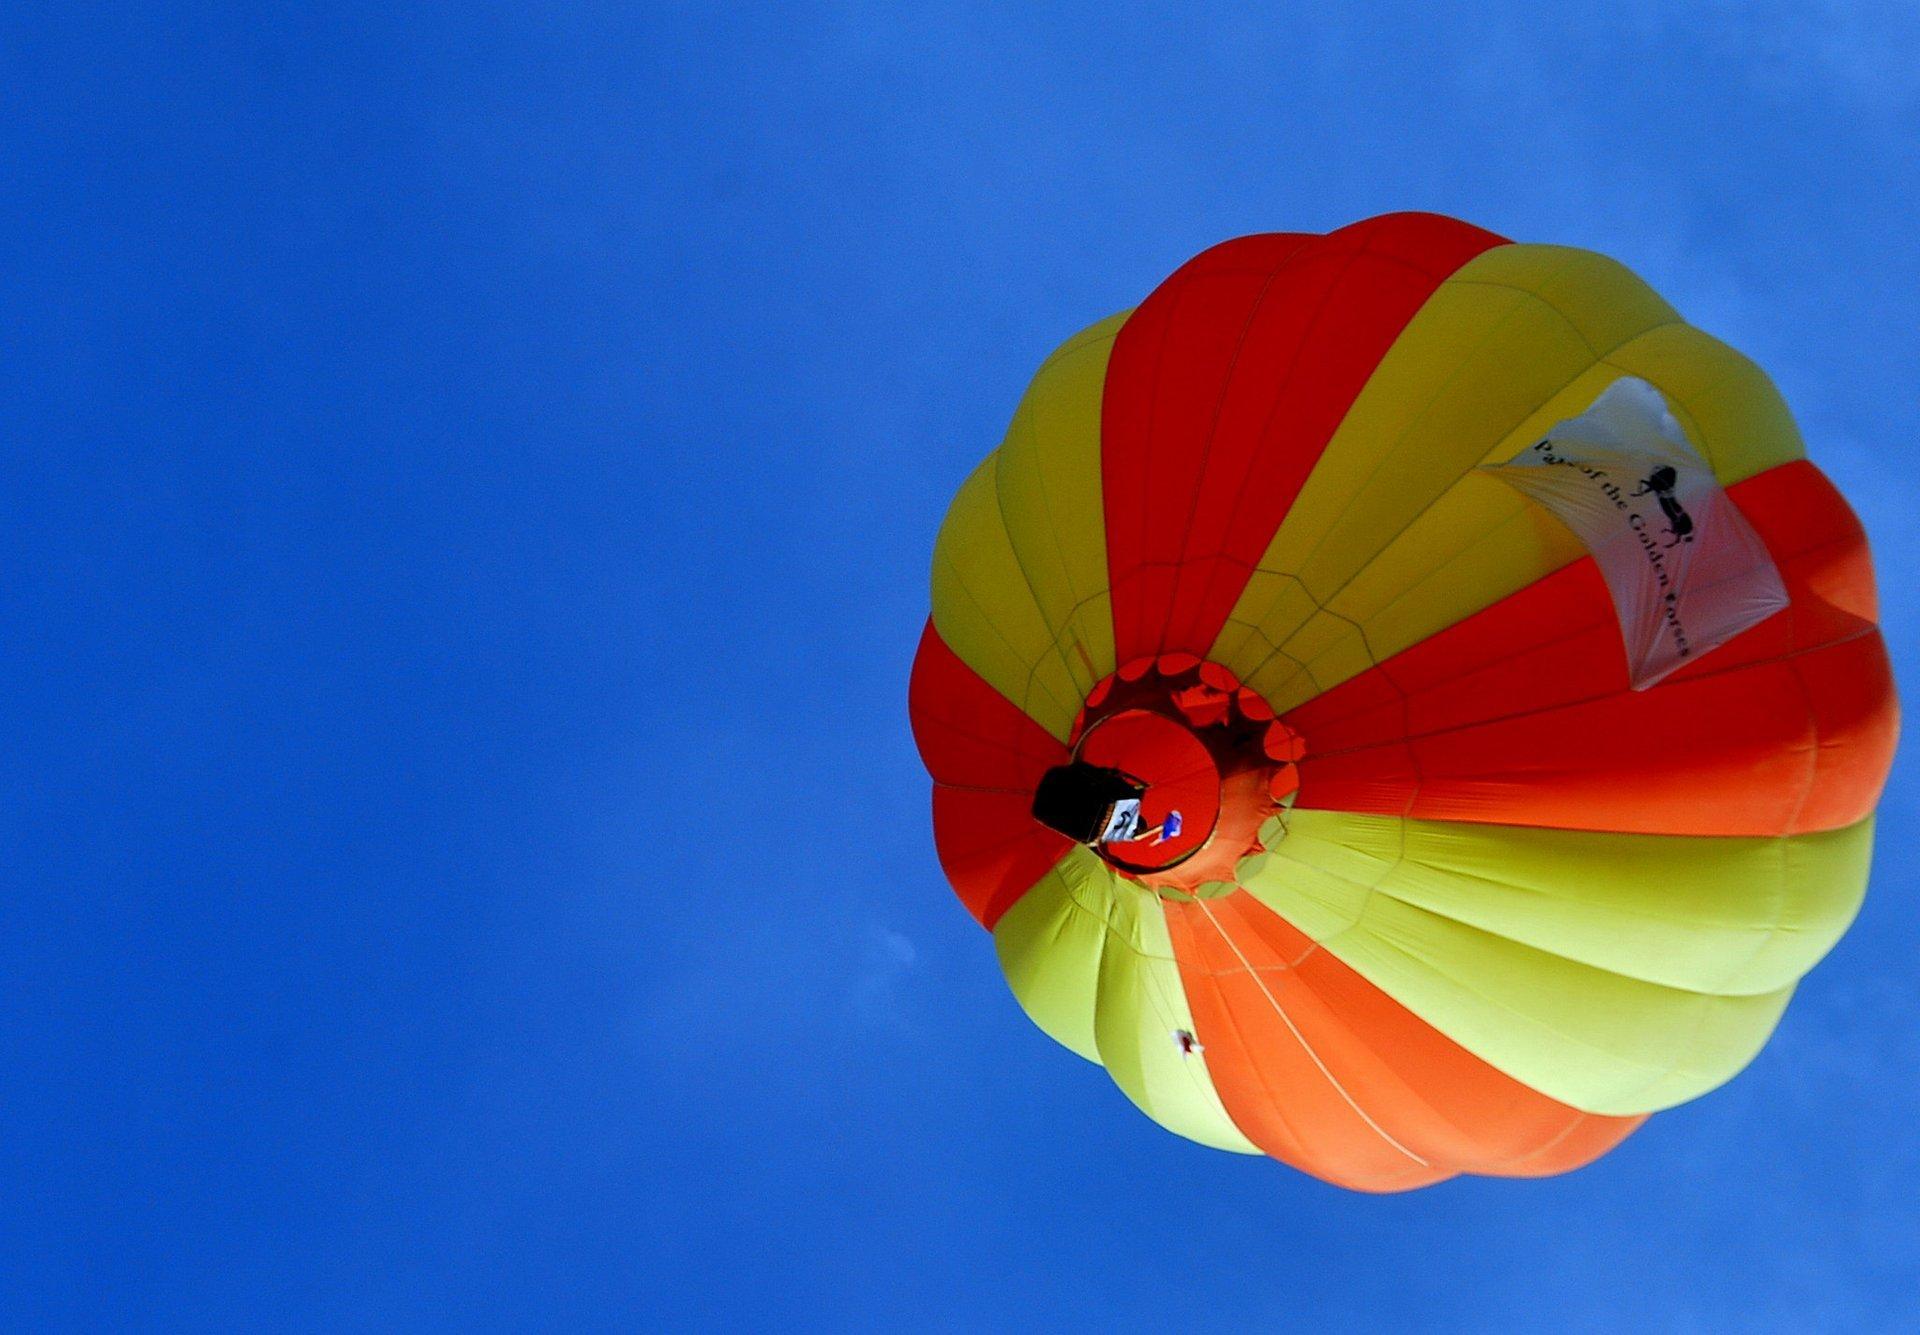 Putrajaya Hot Air Balloon Fiesta 2009 2020